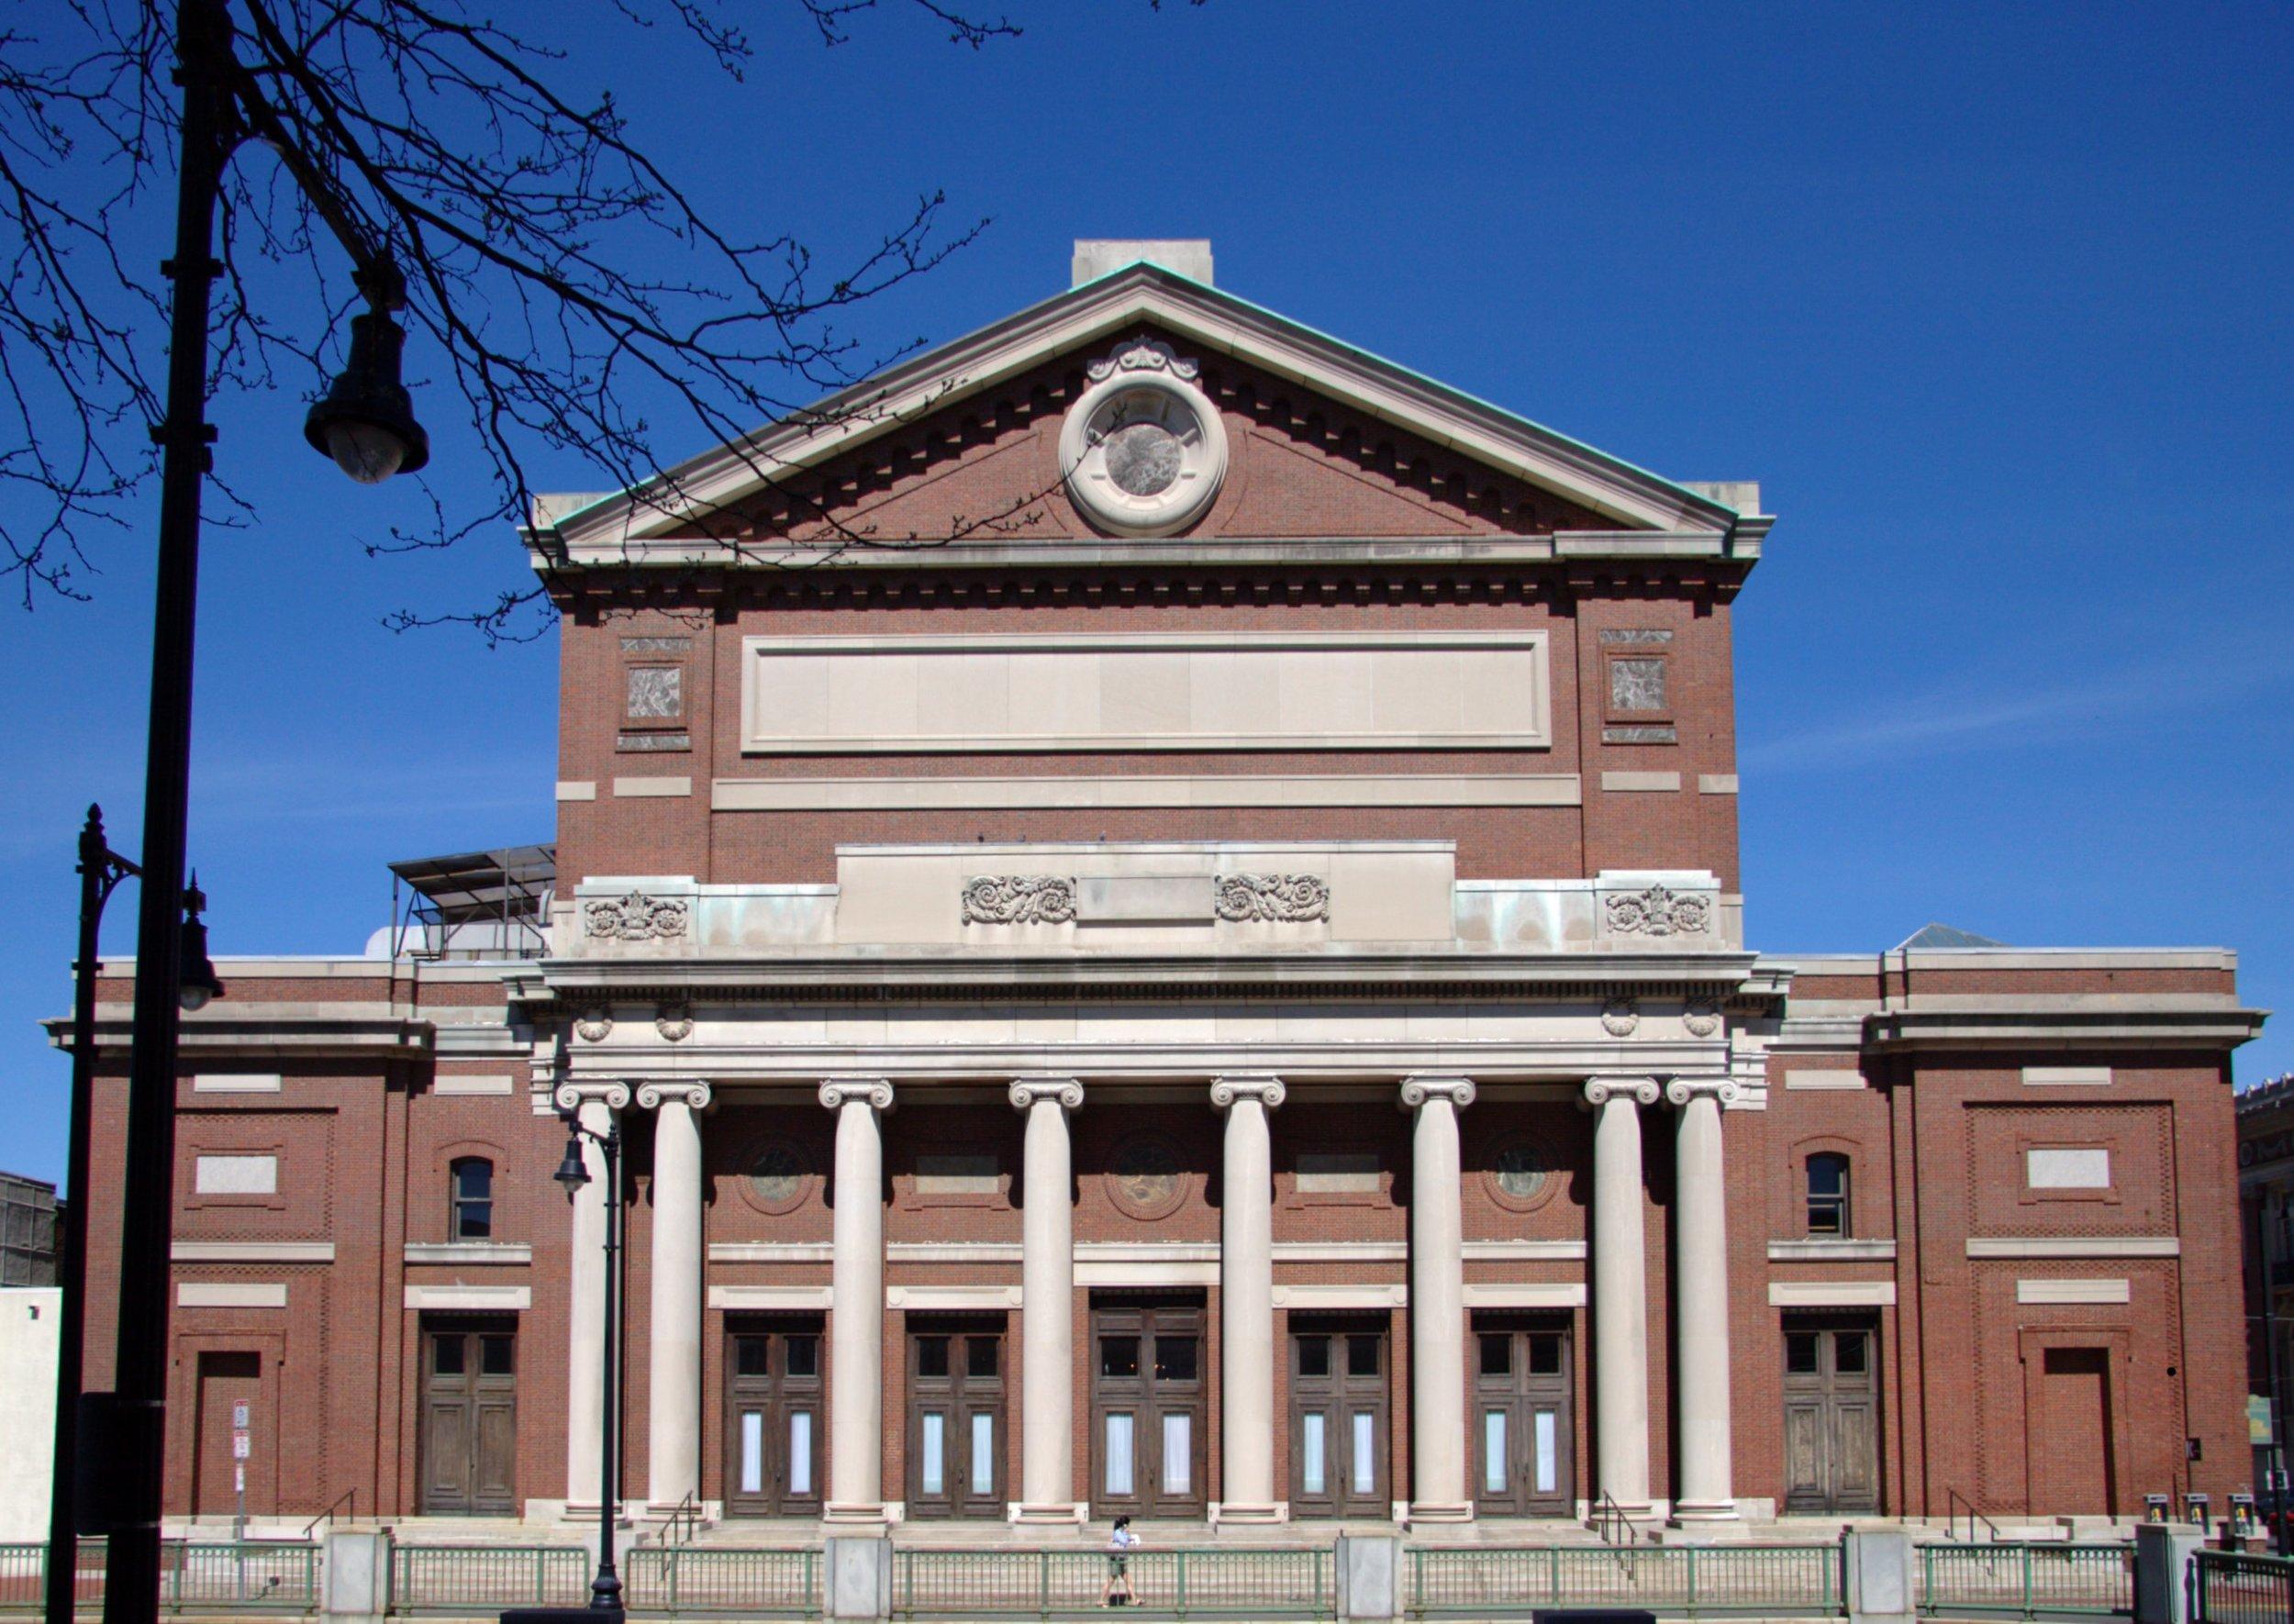 Boston Symphony Hall in Boston, Massachusetts